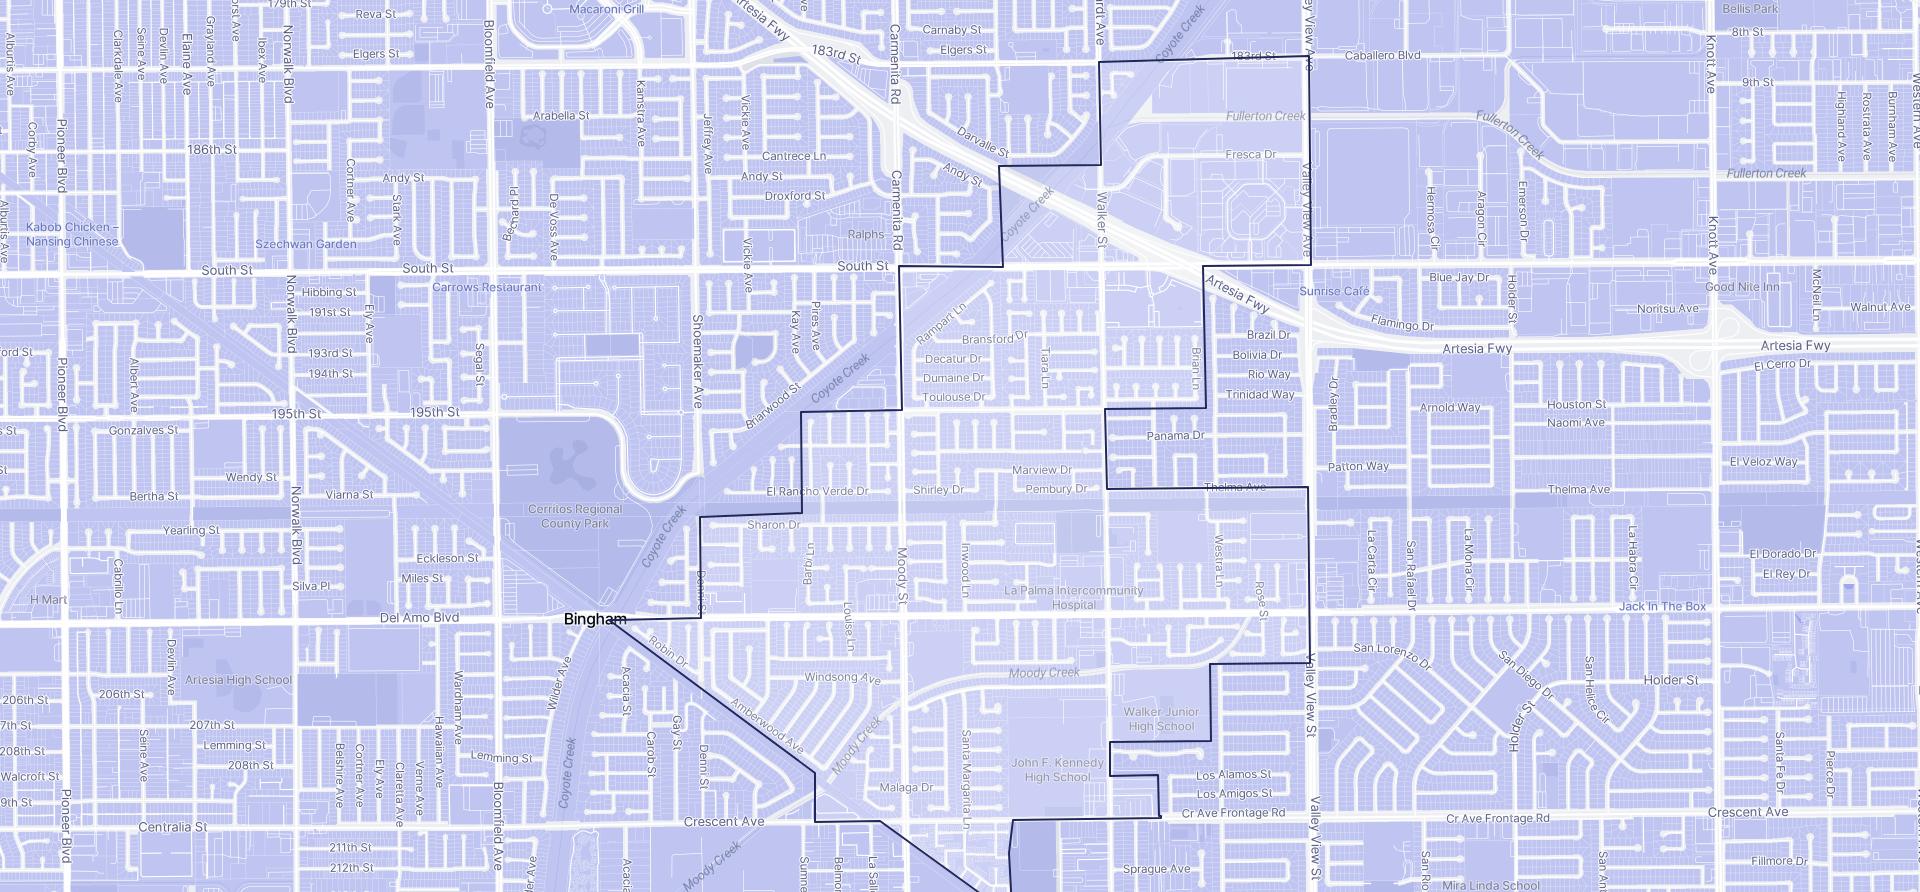 Image of La Palma boundaries on a map.